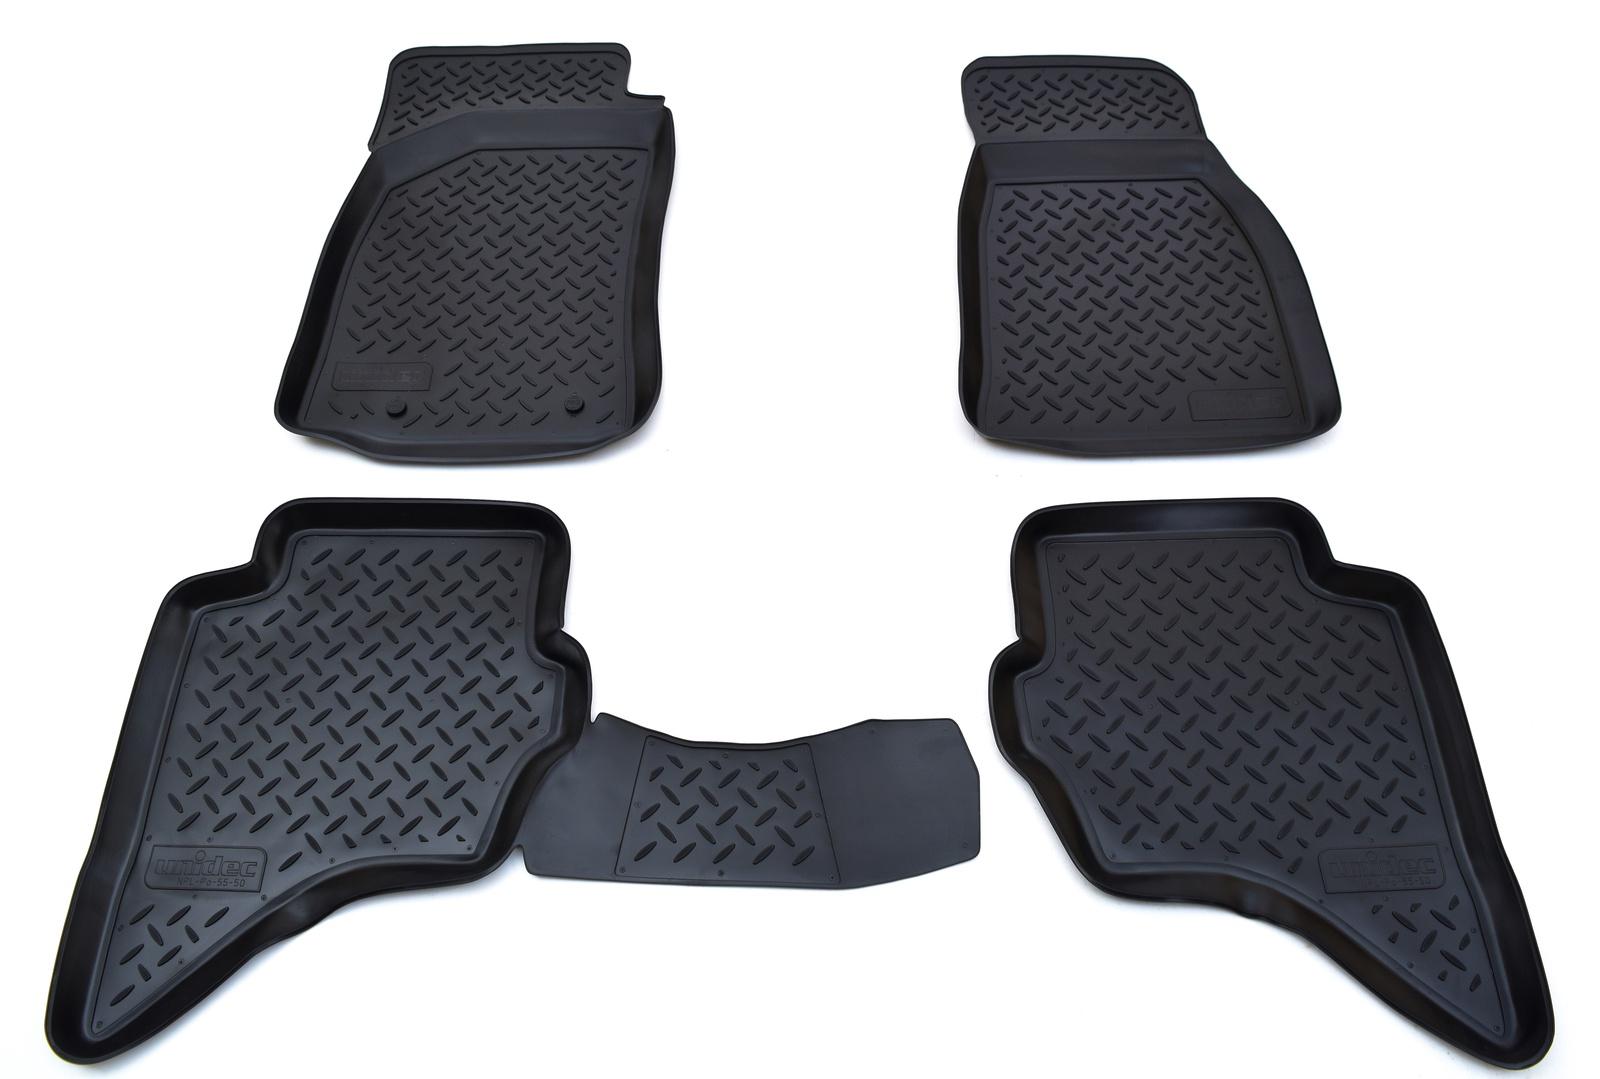 Коврики в салон Norplast для Ford Ranger 2006, для Mazda BT-50 2006, NPL-Po-55-50, черный benelux 2009